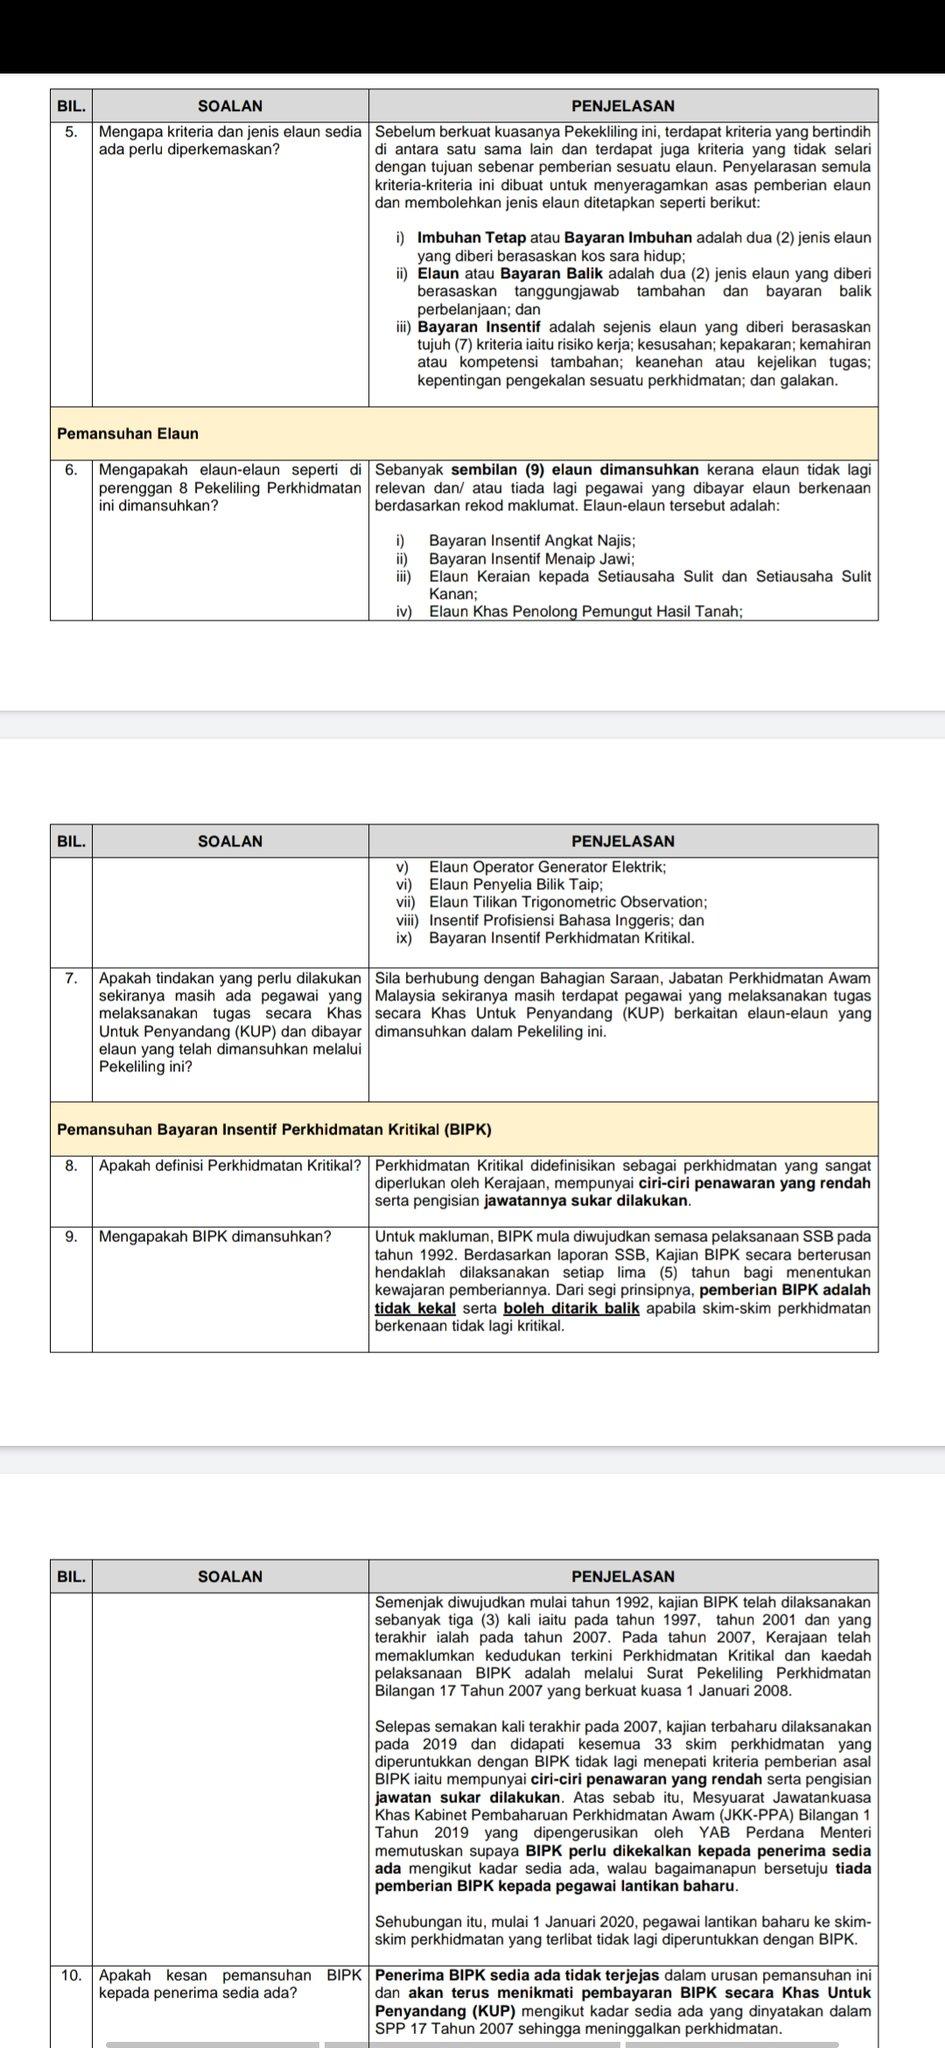 Pdf Kos Sara Hidup Tinggi Cabaran Dan Saranan Dr Khairul Hamimah Binti Mohammad Jodi Staff Academia Edu